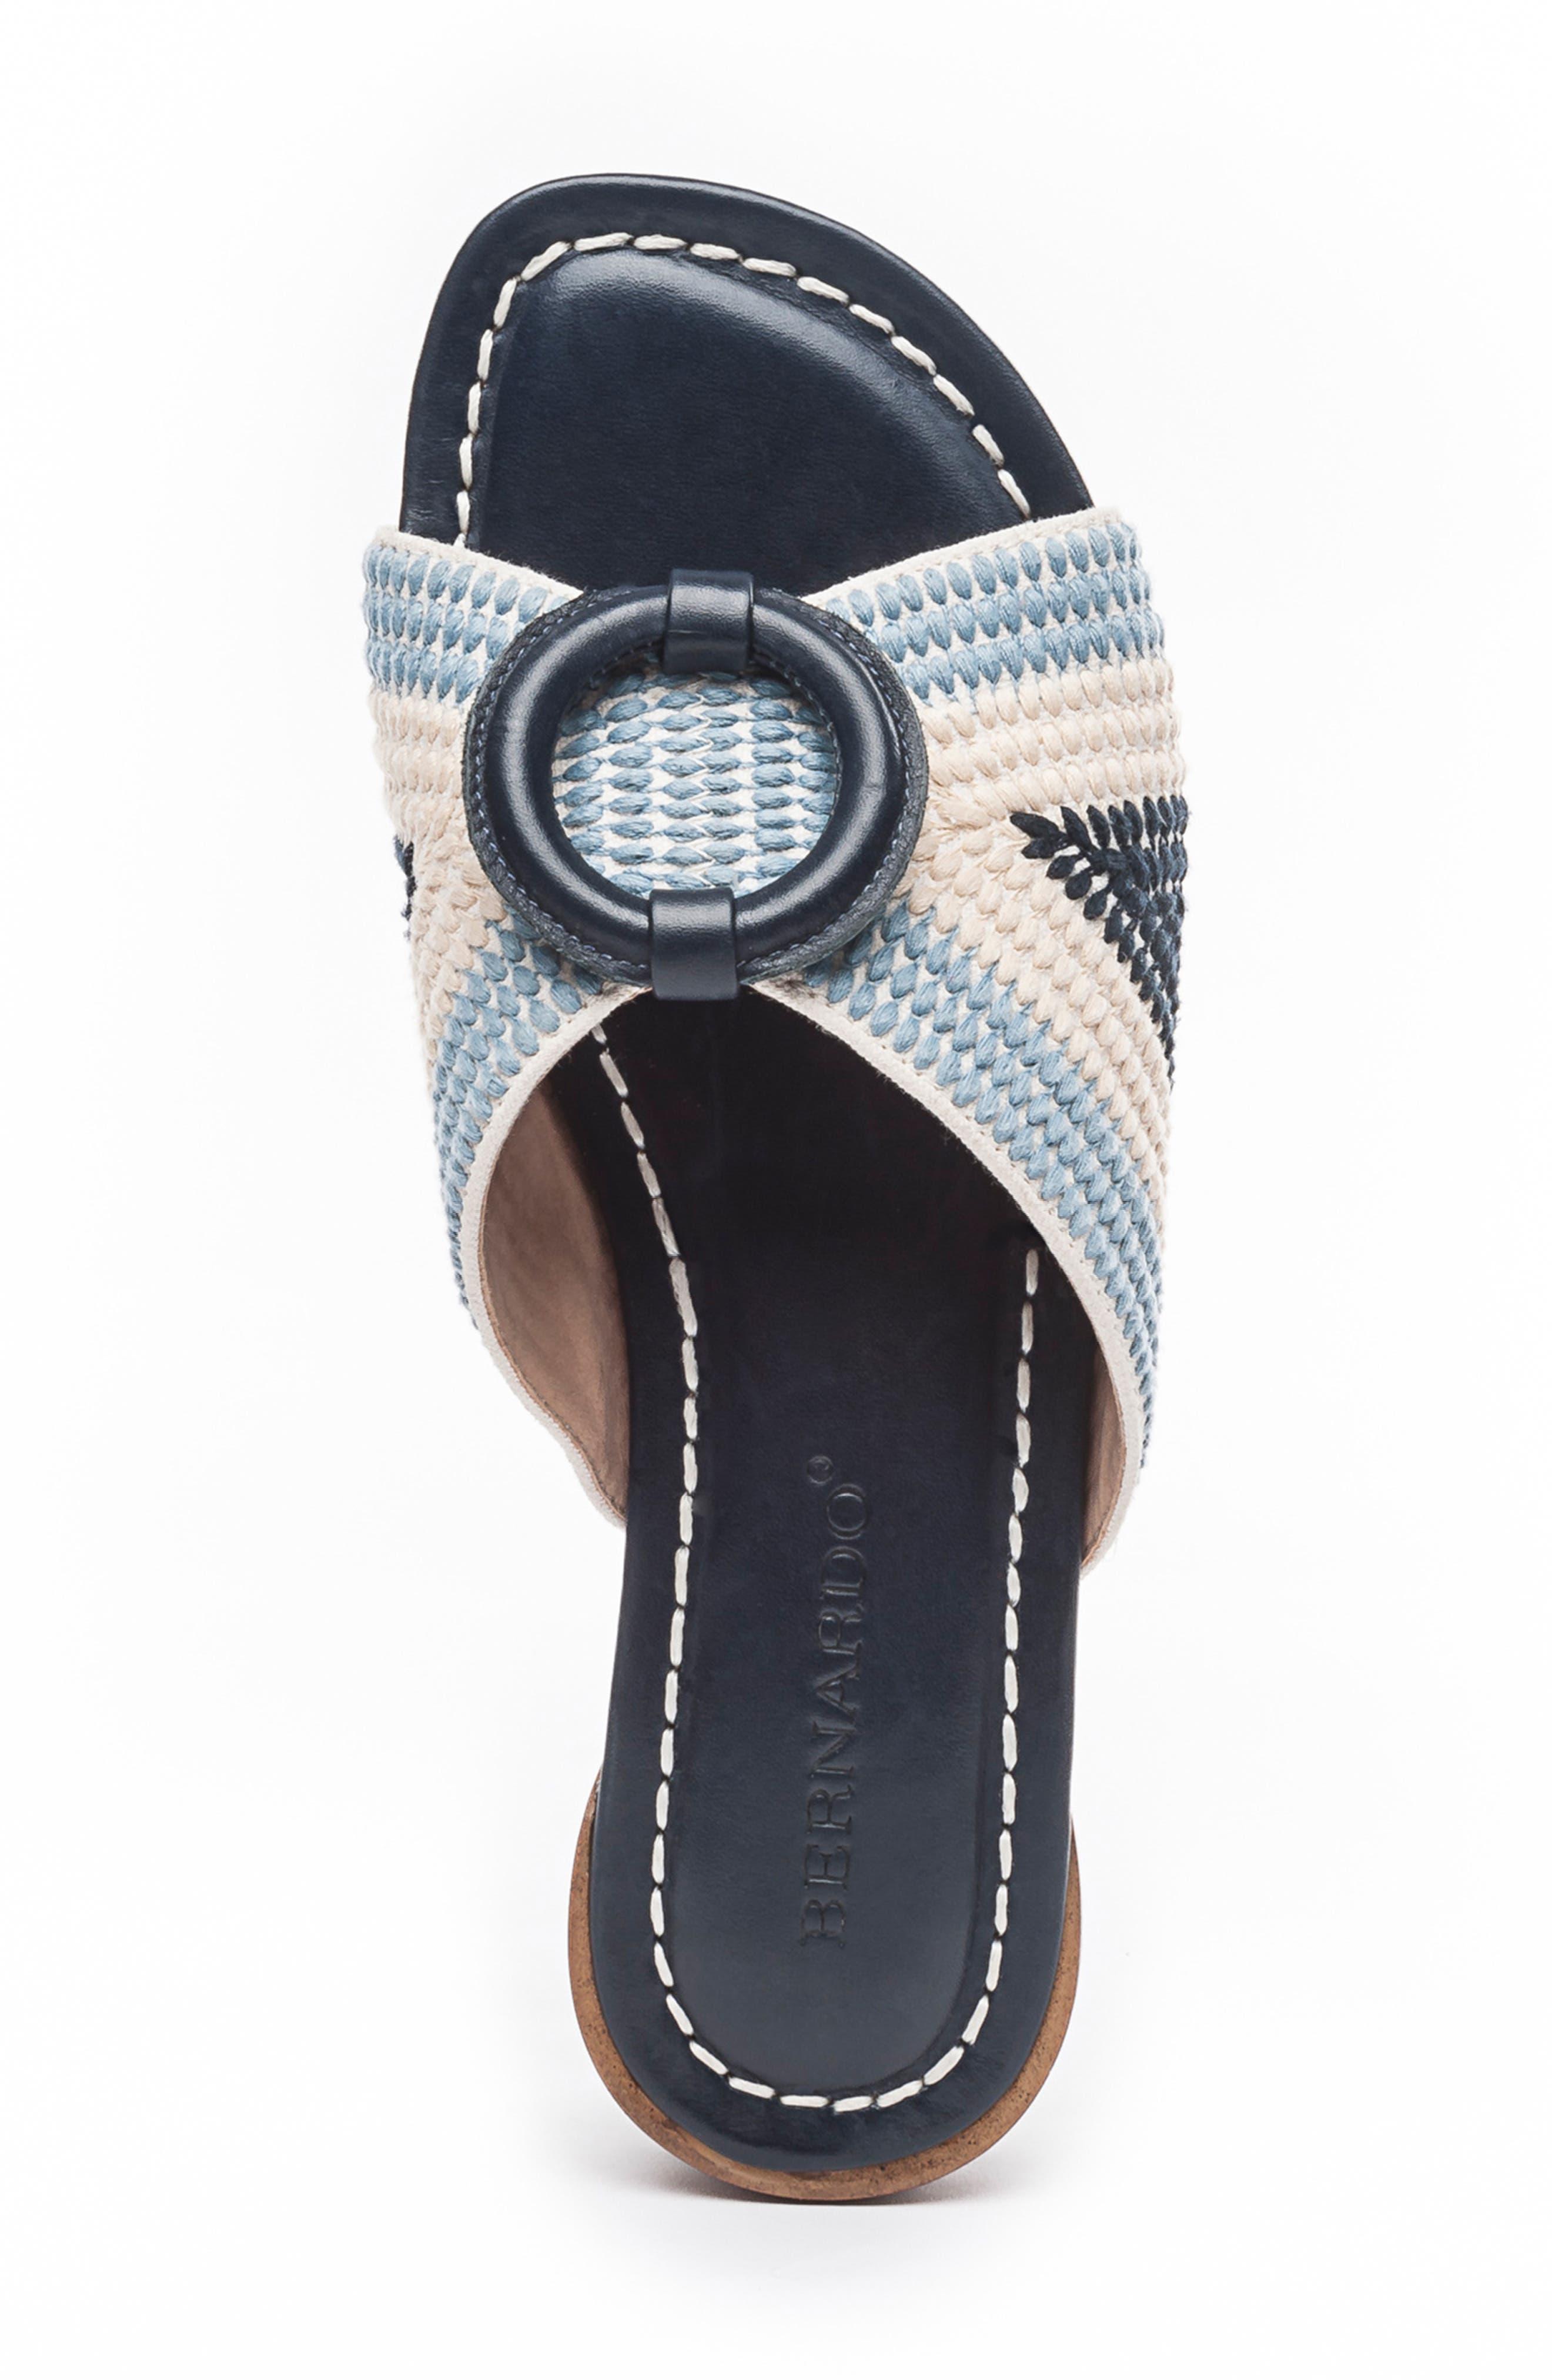 BERNARDO, Footwear Tay Slide Sandal, Alternate thumbnail 5, color, BLUE/ CREAM LEATHER